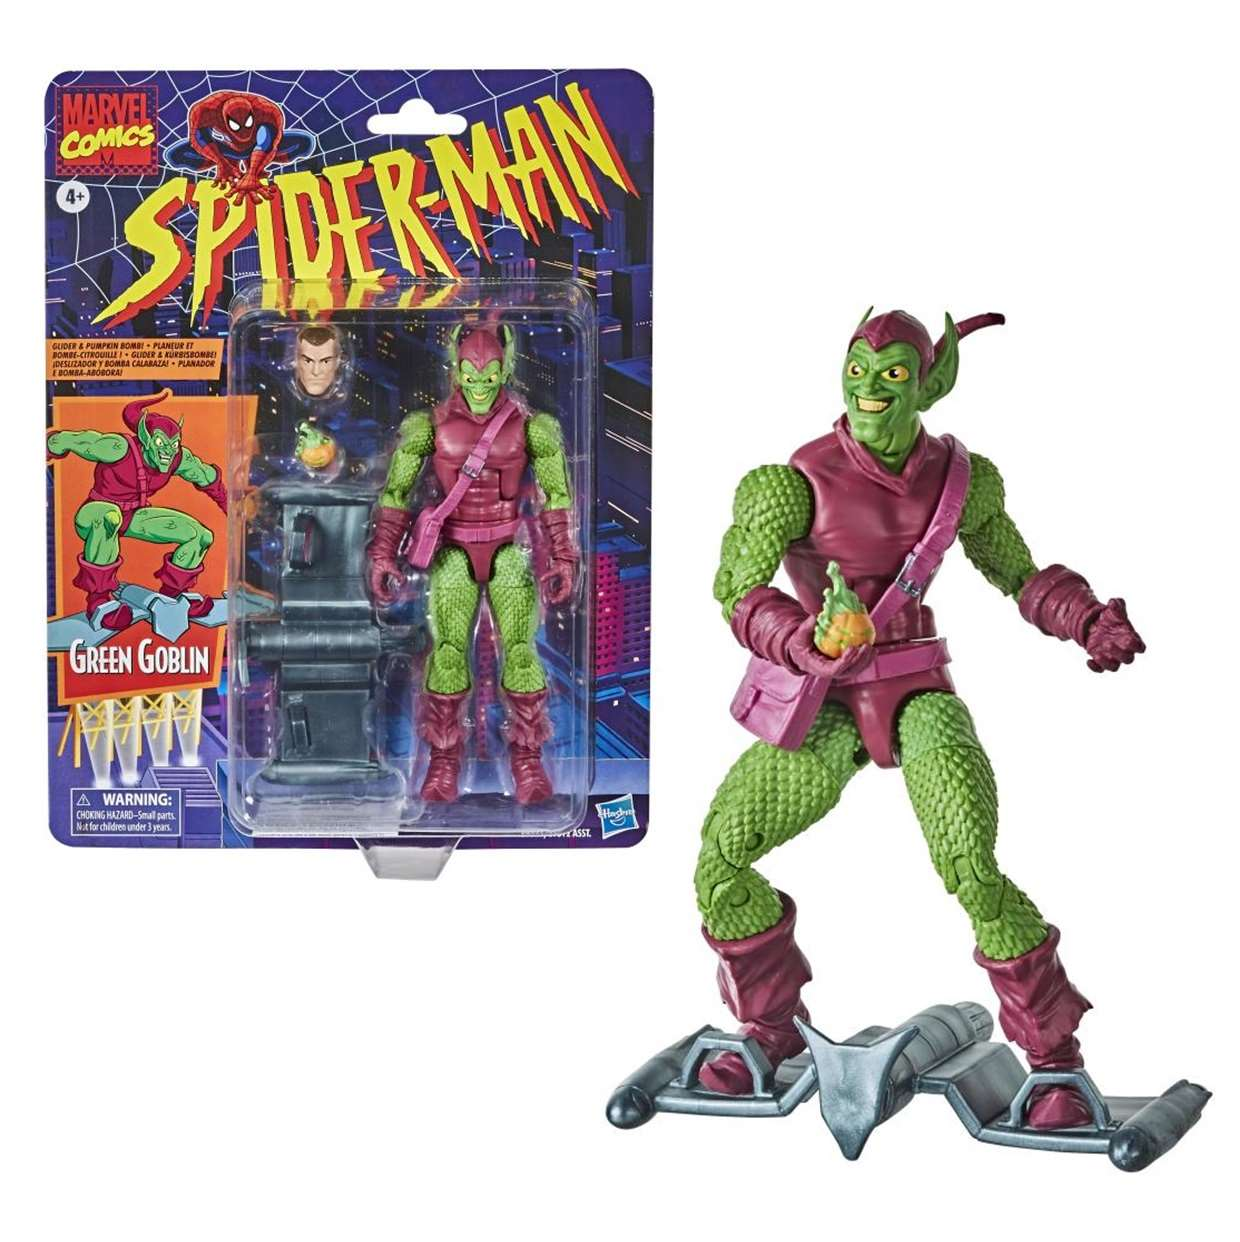 Green Goblin Vintage Figura Marvel Comics Hasbro 6 Pulgadas